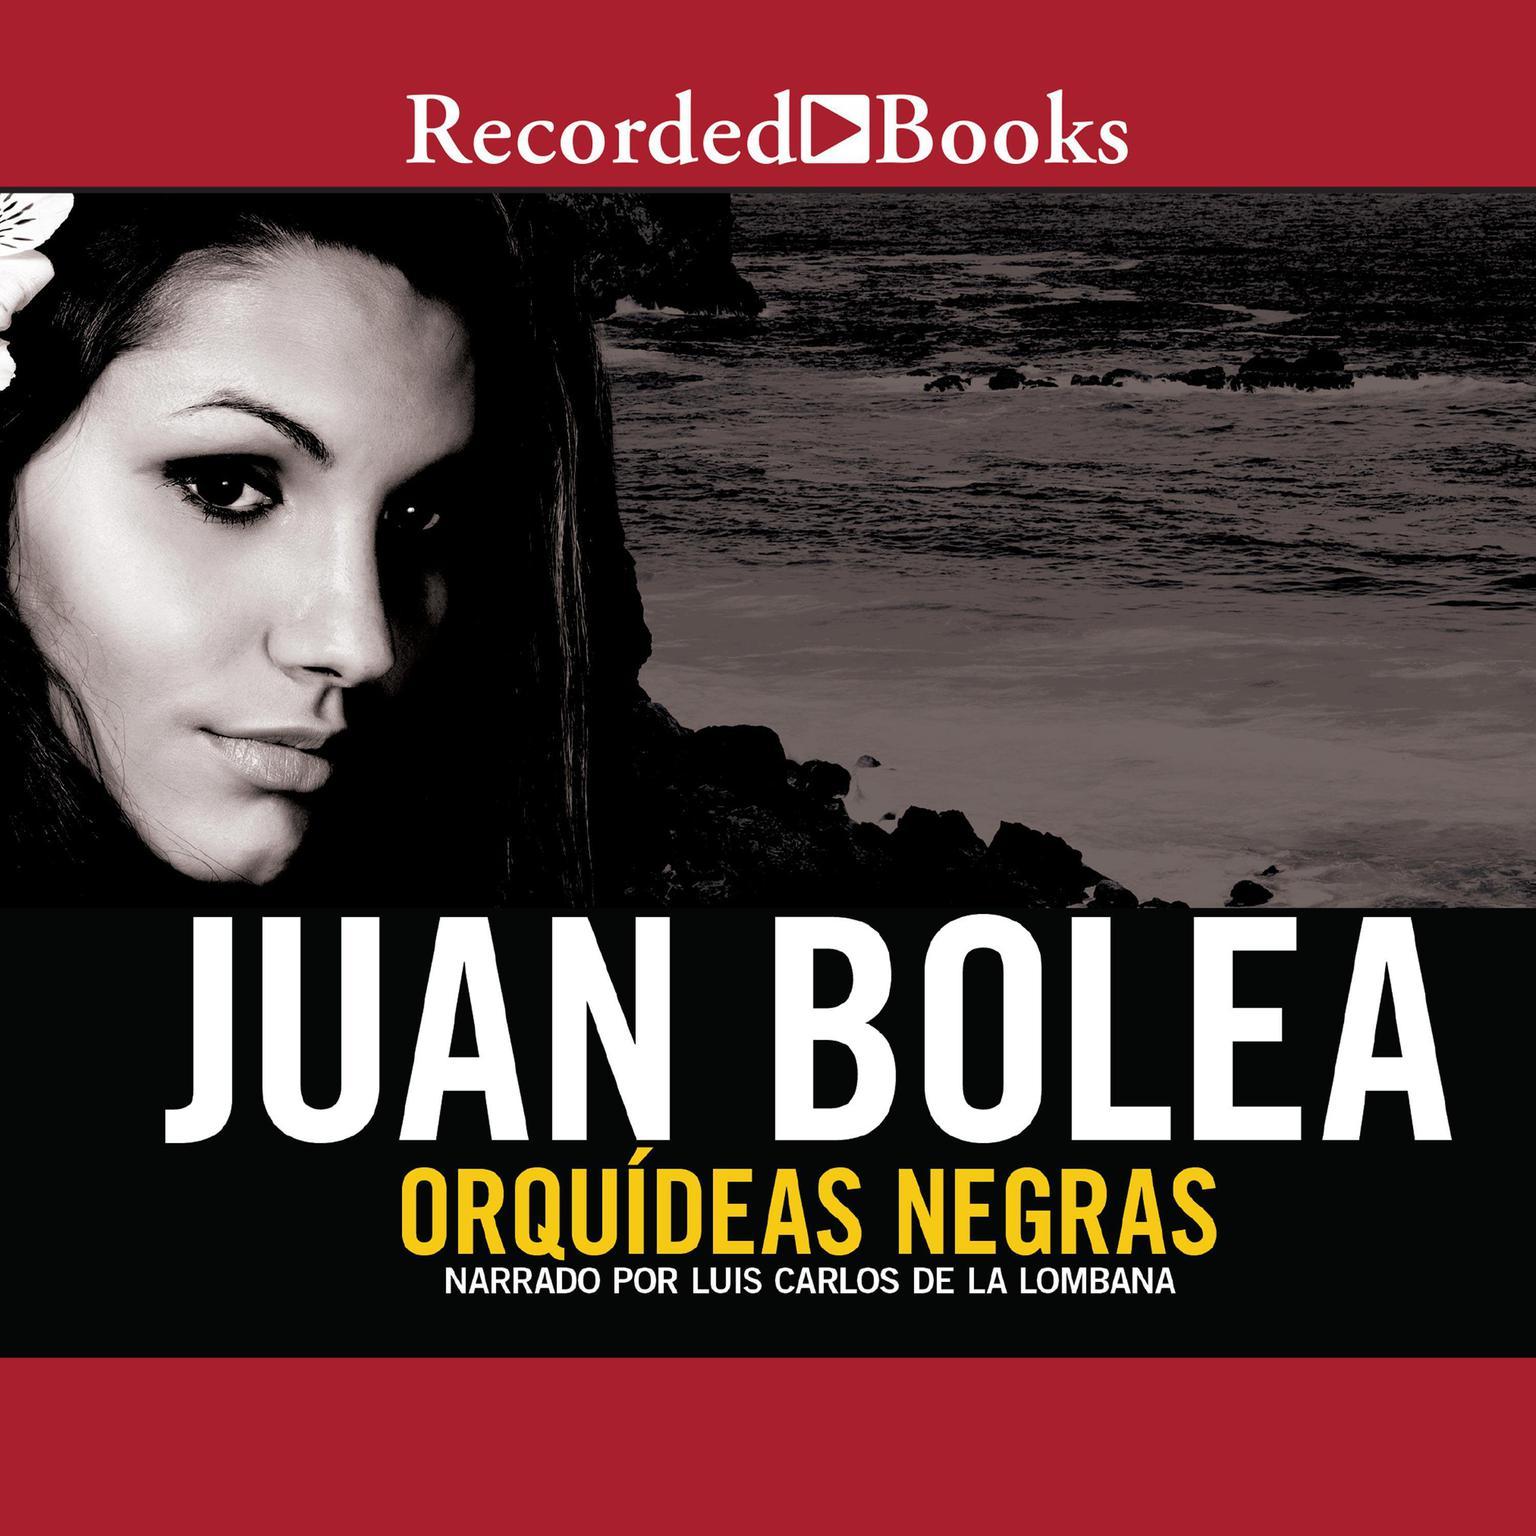 Orquídeas negras  Audiobook, by Juan Bolea